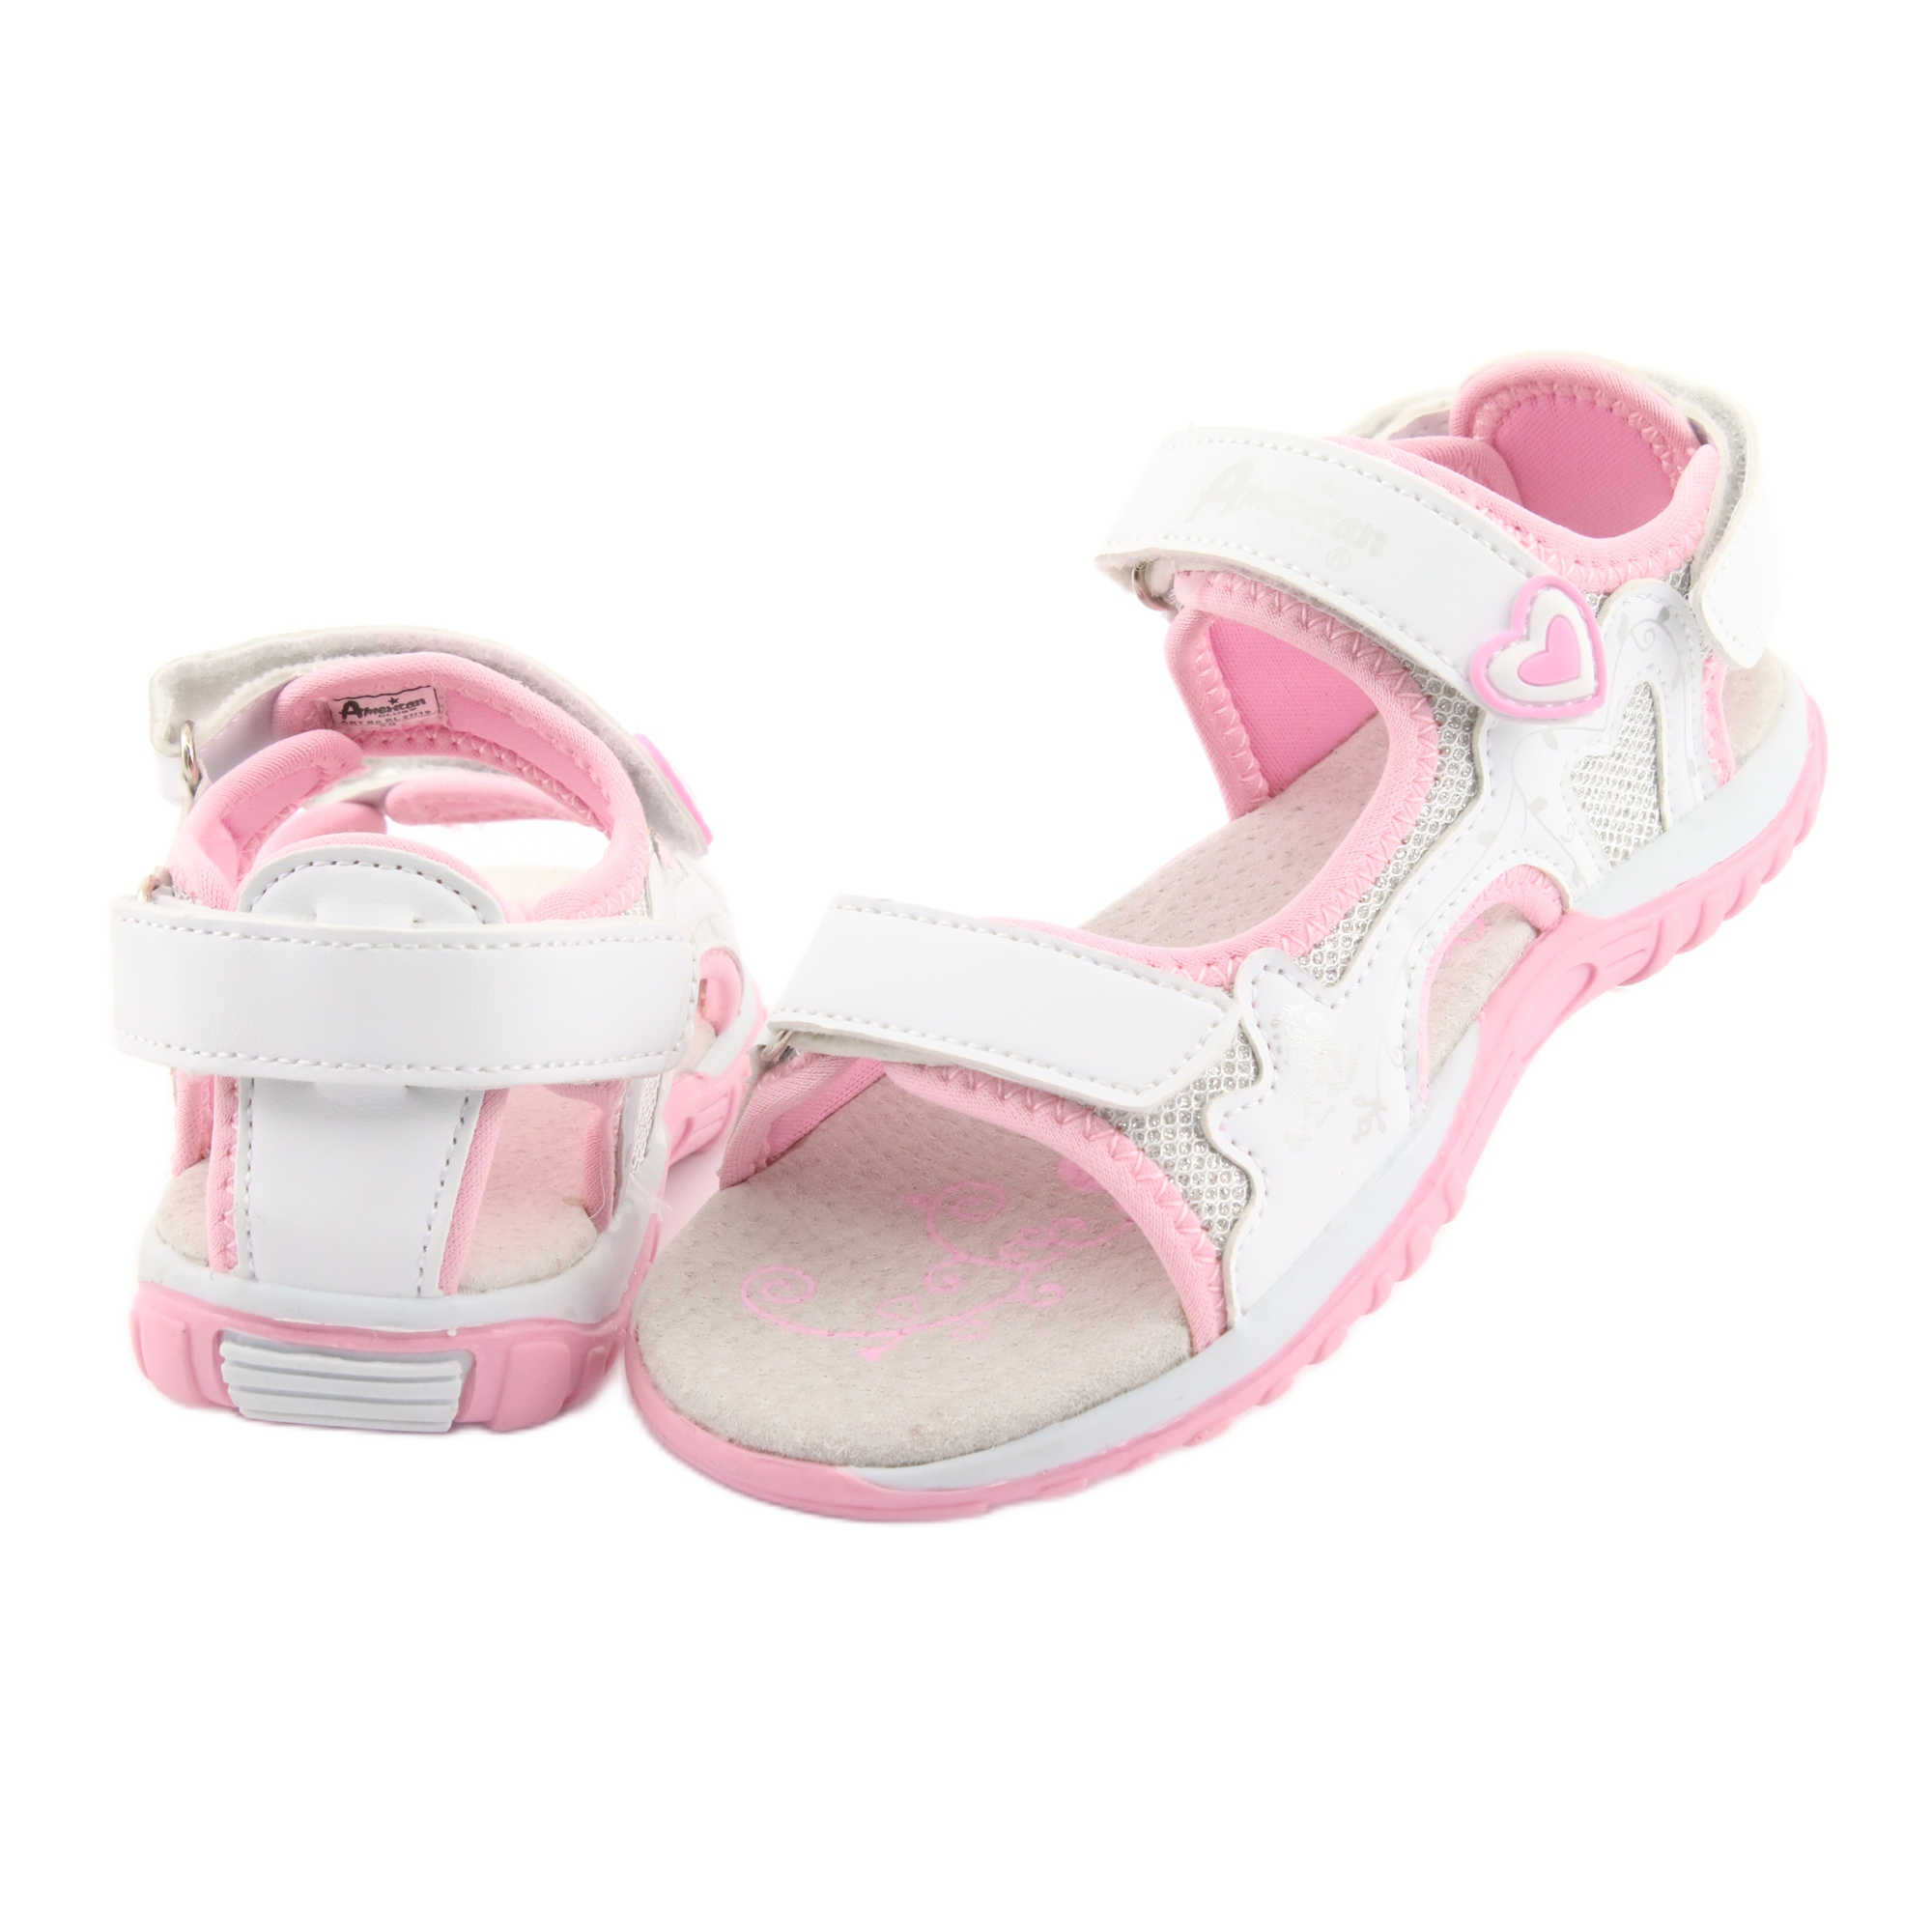 miniatura 5 - Sandali da donna di American Club bianco grigio rosa